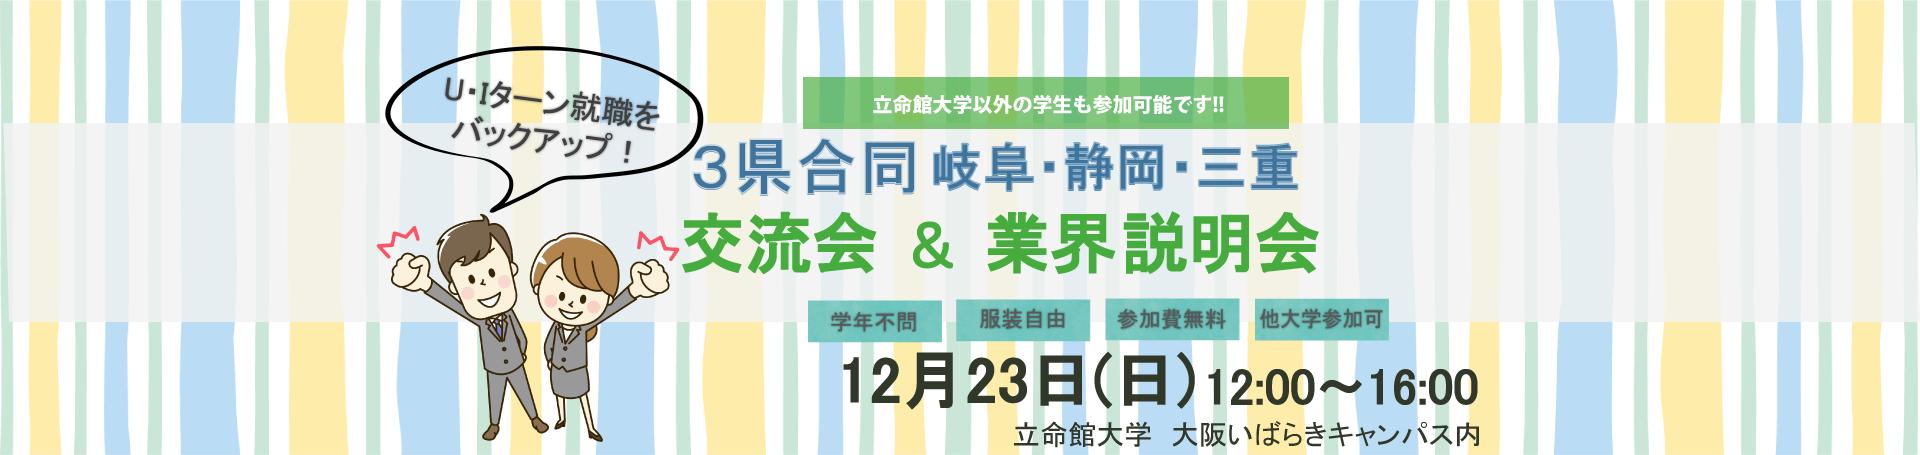 U・Iターン就職をバックアップ。立命館大学以外の学生も参加可能です。3県合同岐阜・静岡・三重 交流会&業界説明会